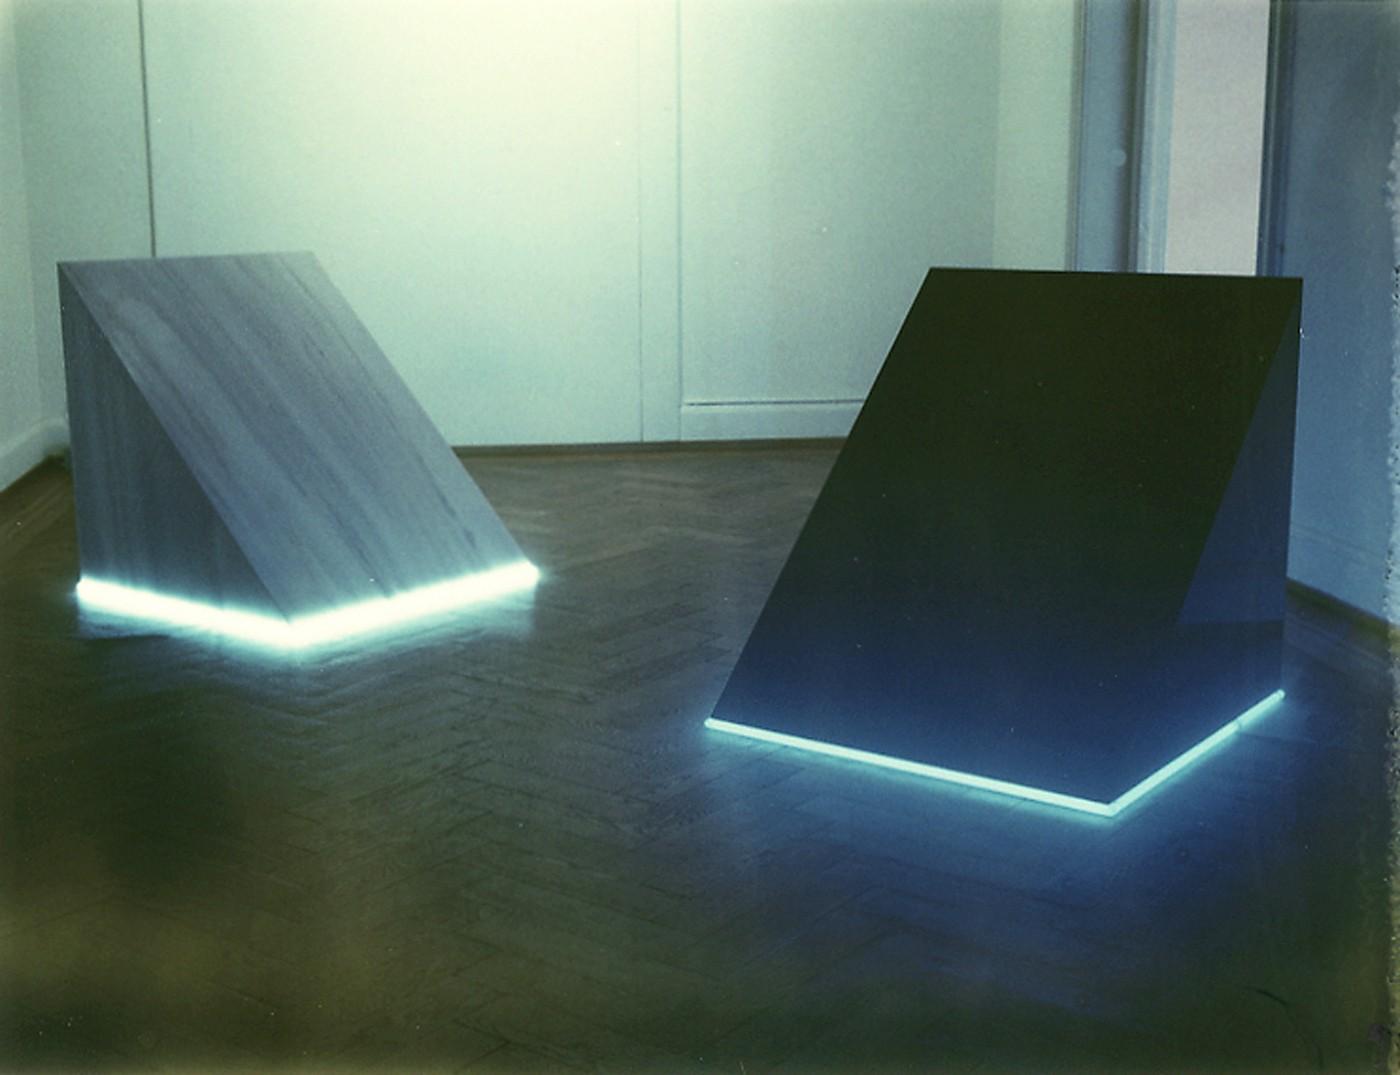 Marmor/Granit Prisma, 1977